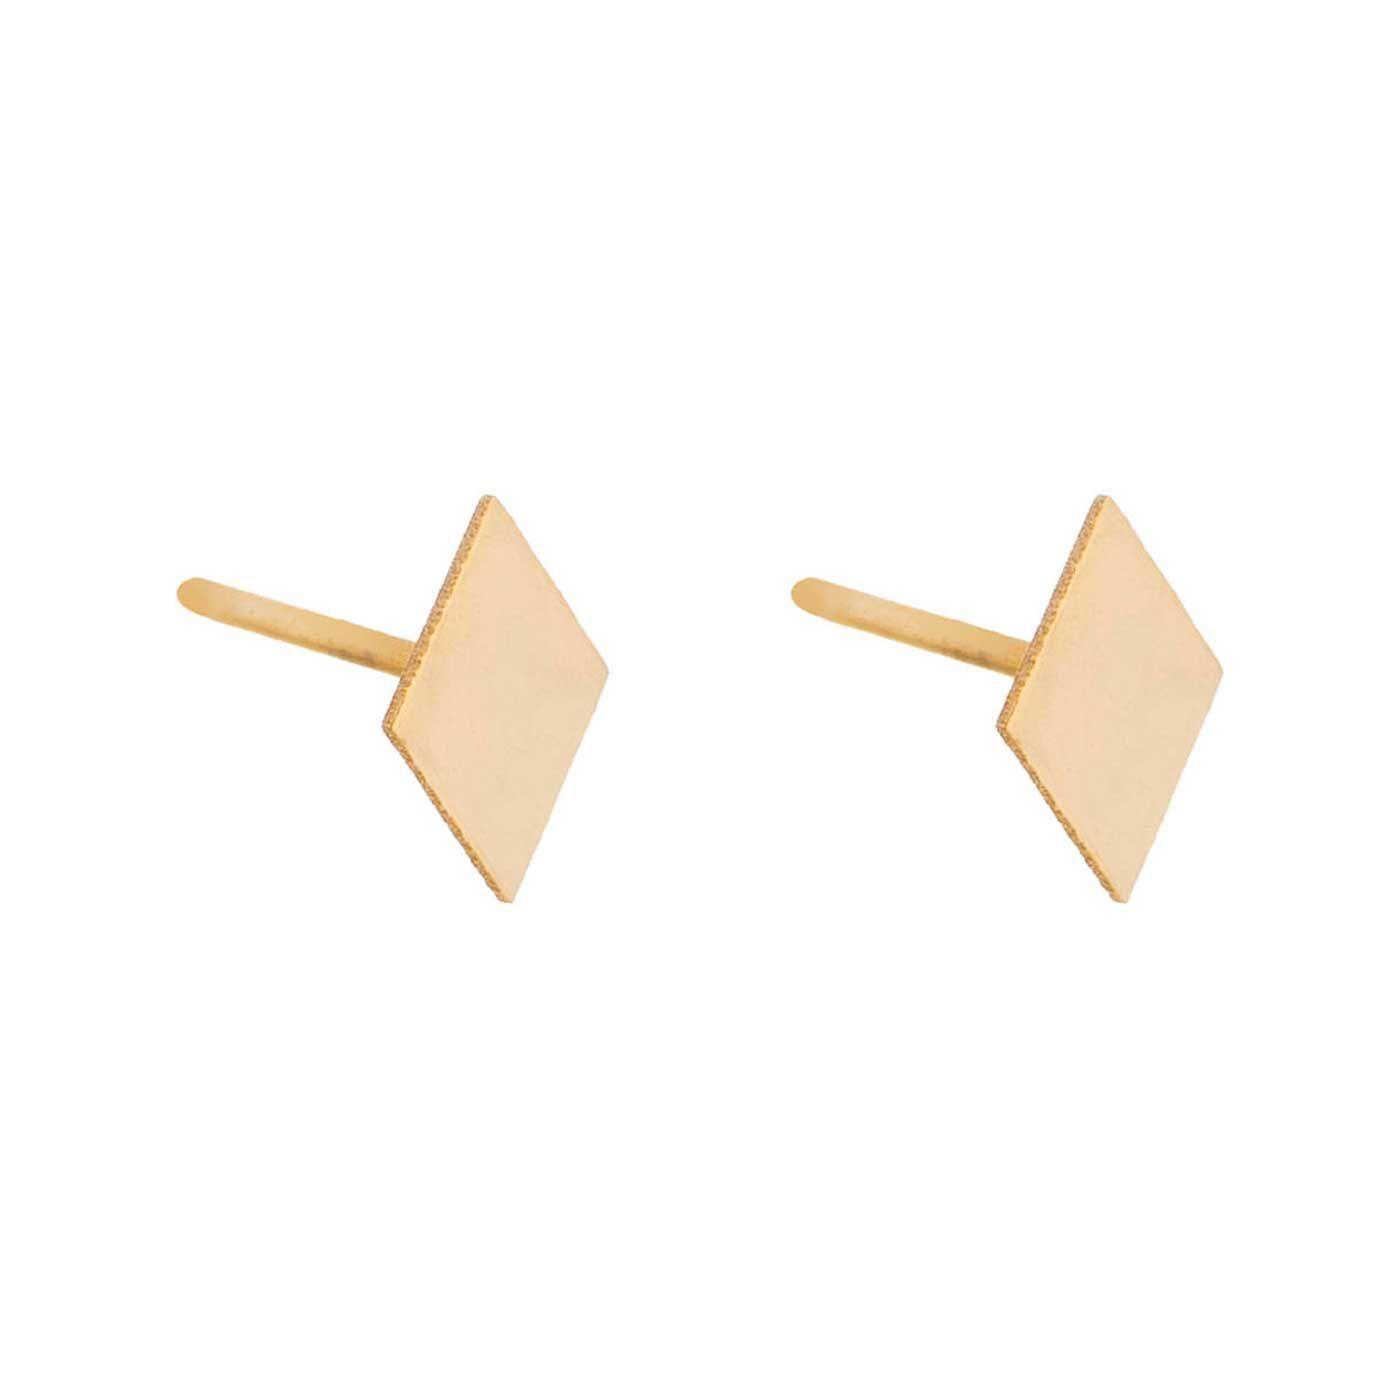 گوشواره طلا 18 عیار زنانه کانیار گالری کد GOA102 -  - 4